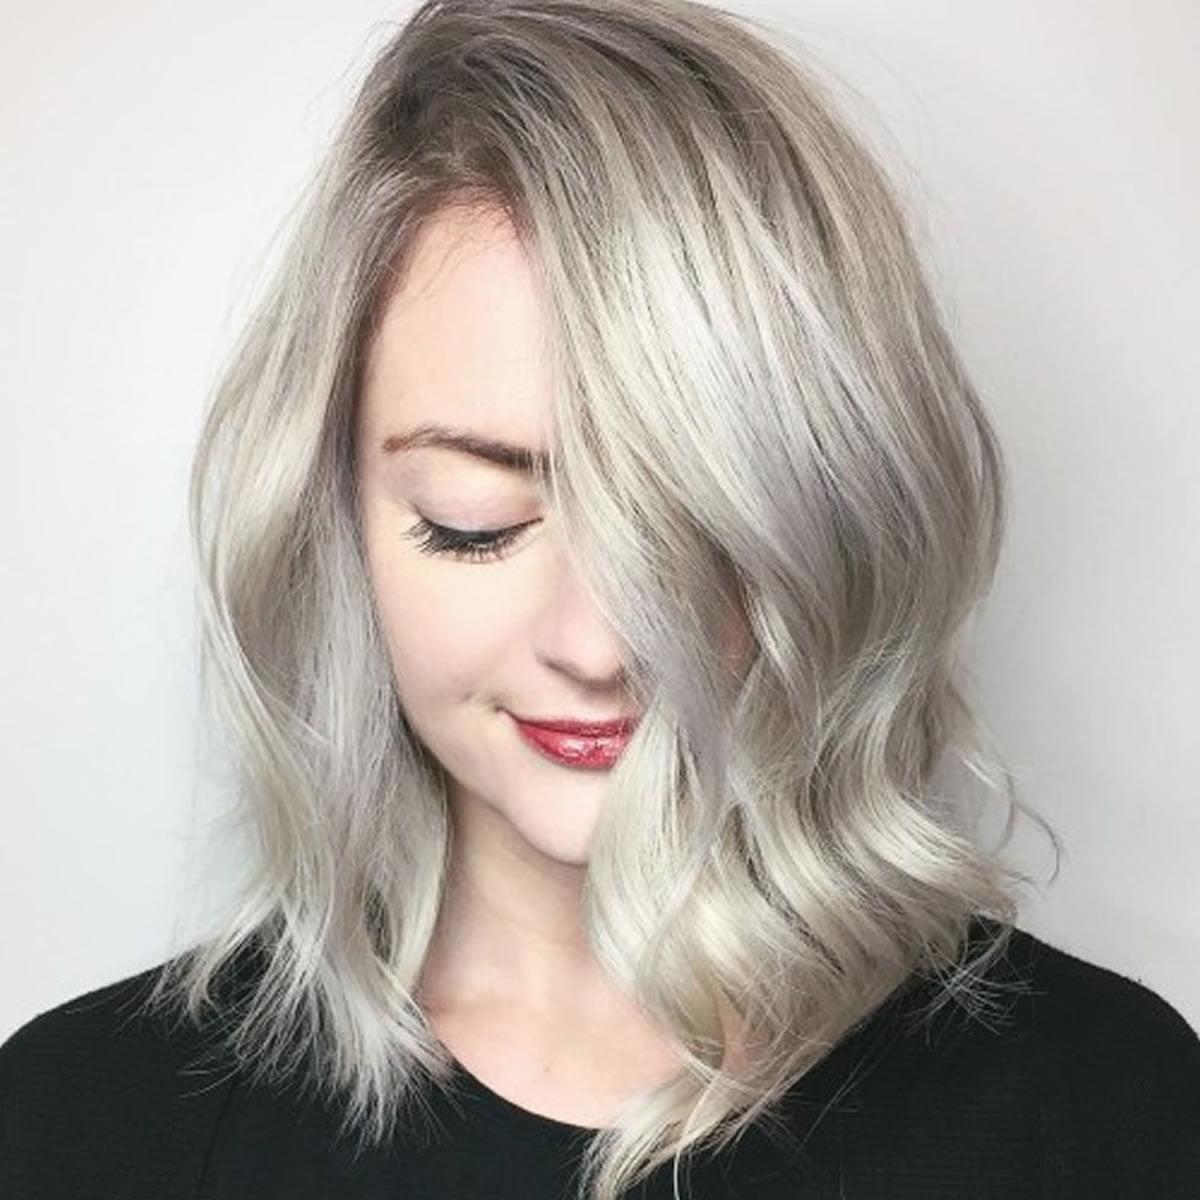 Bob Hairstyles for 2018 Inspiring 60 Long Bob Haircut Ideas  Page 8  HAIRSTYLES